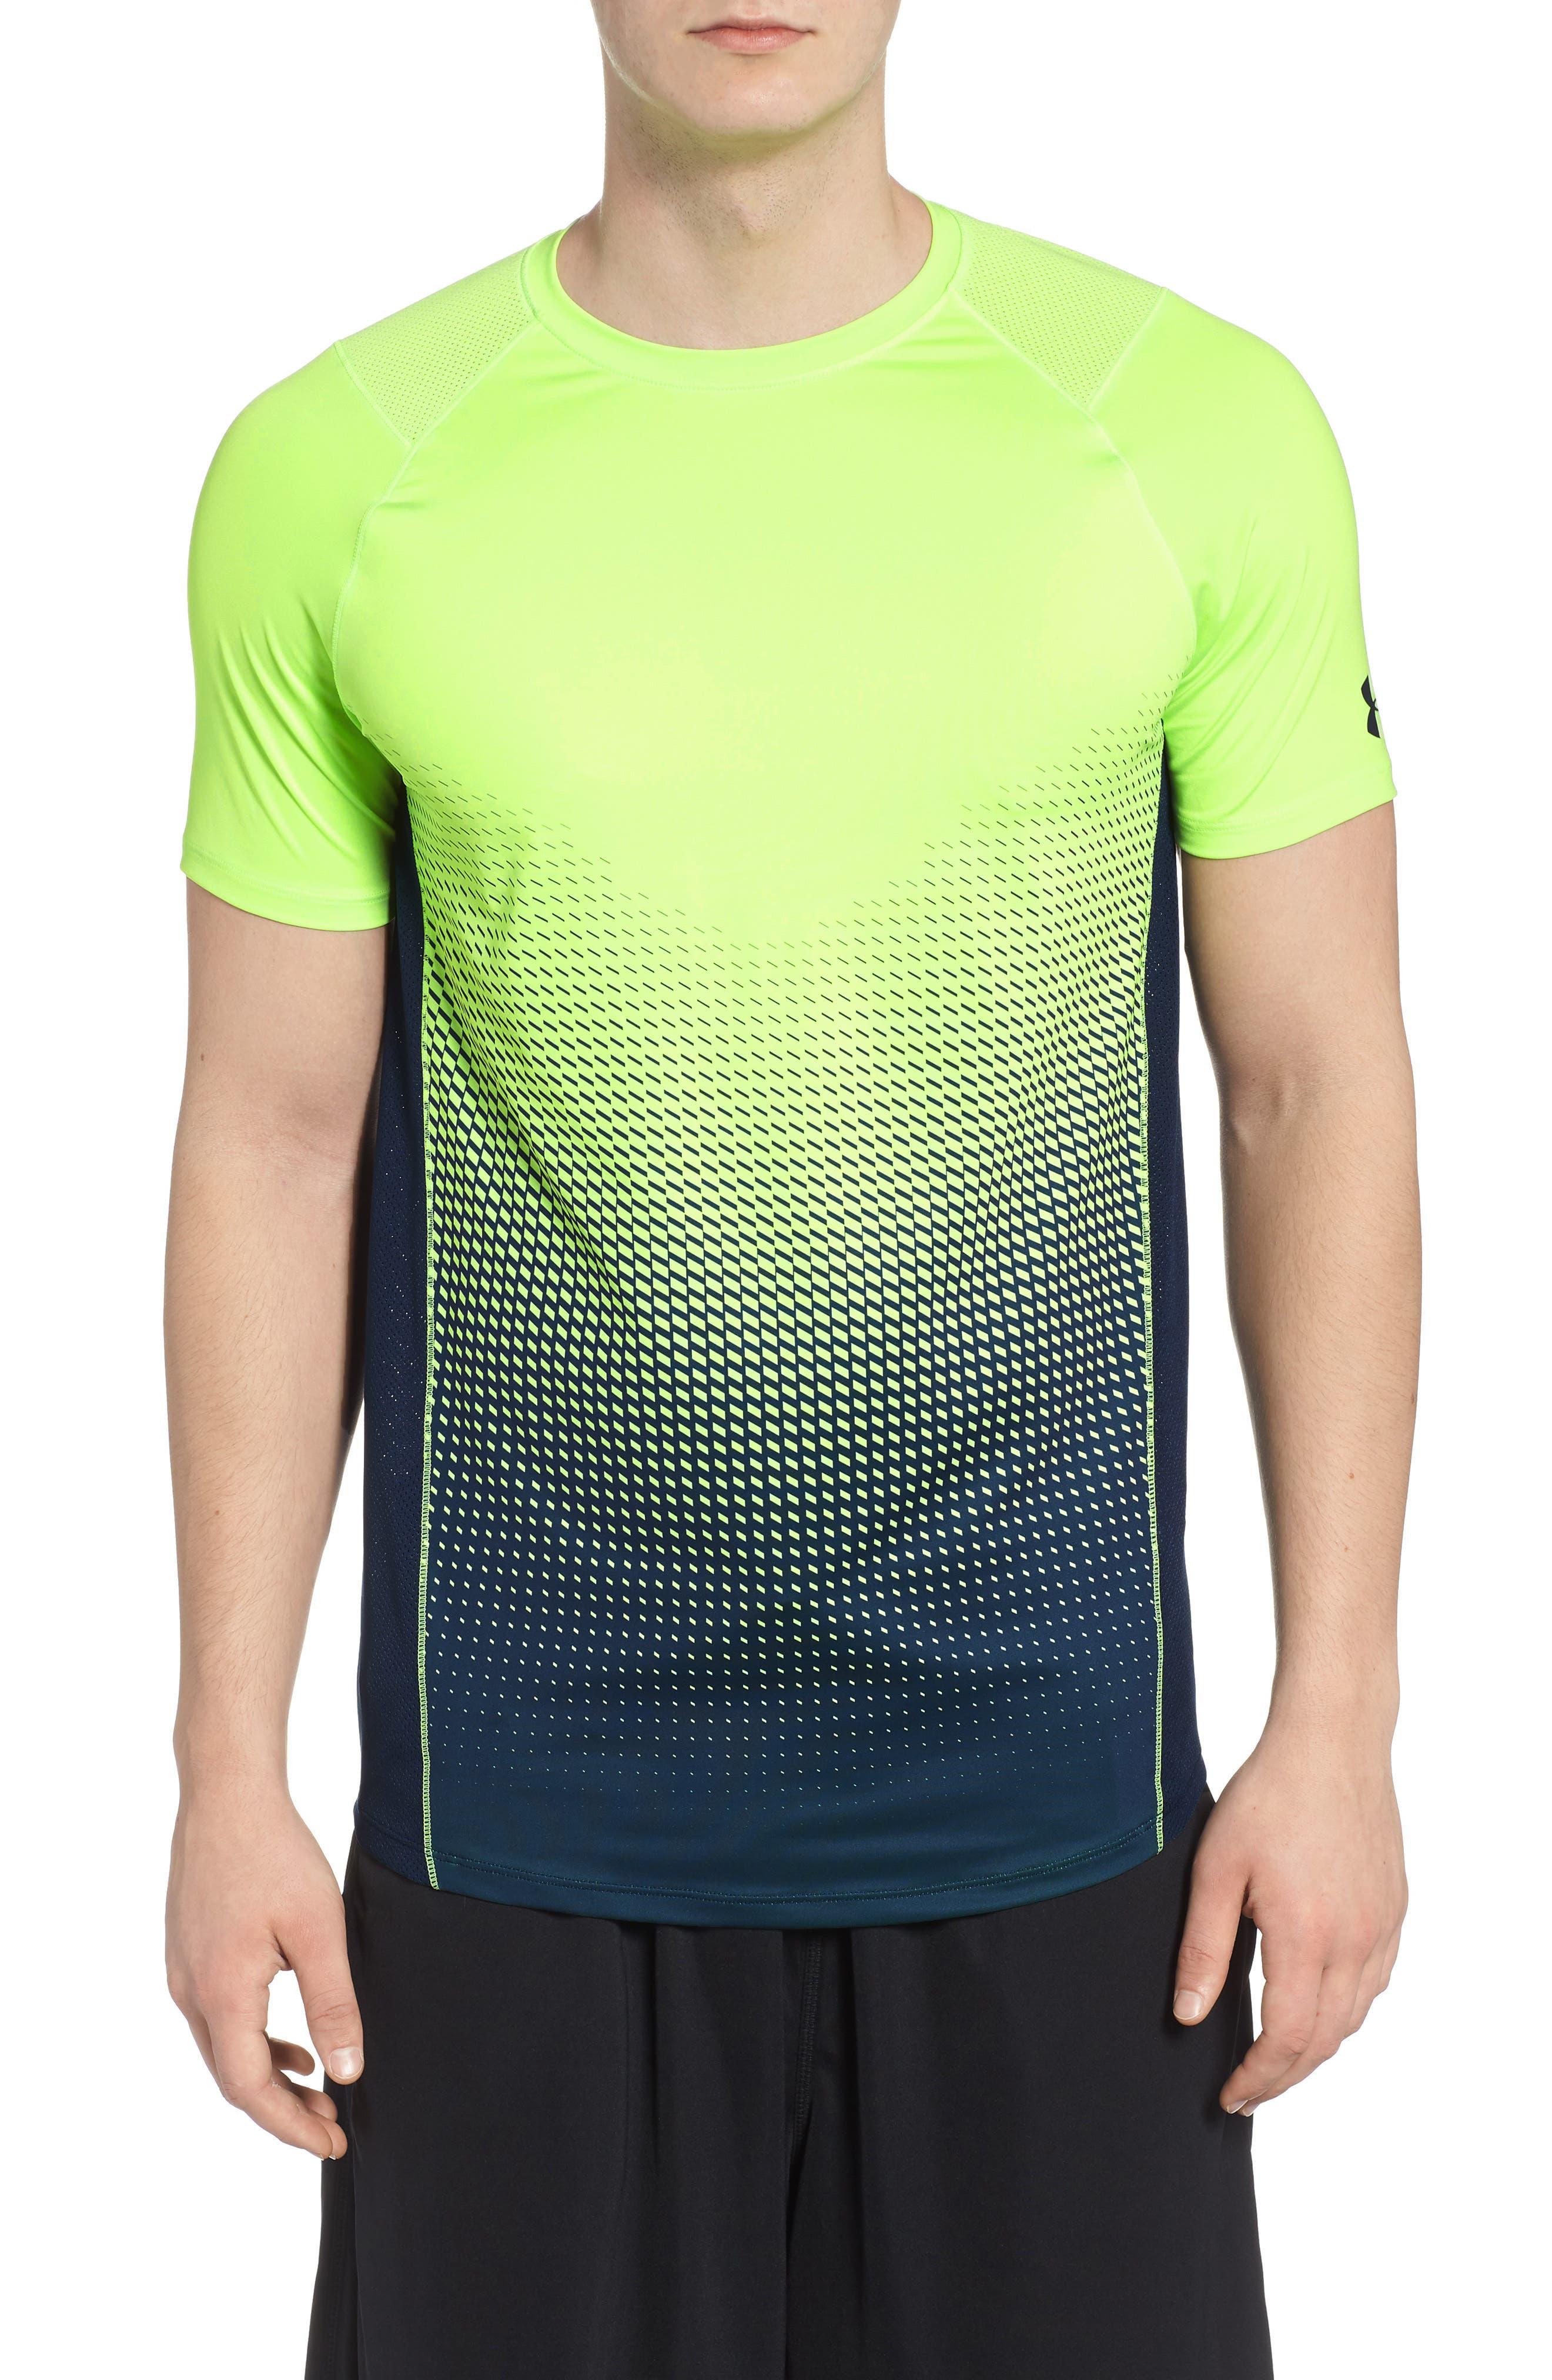 Alternate Image 1 Selected - Under Armour MK1 Dash Crewneck T-Shirt